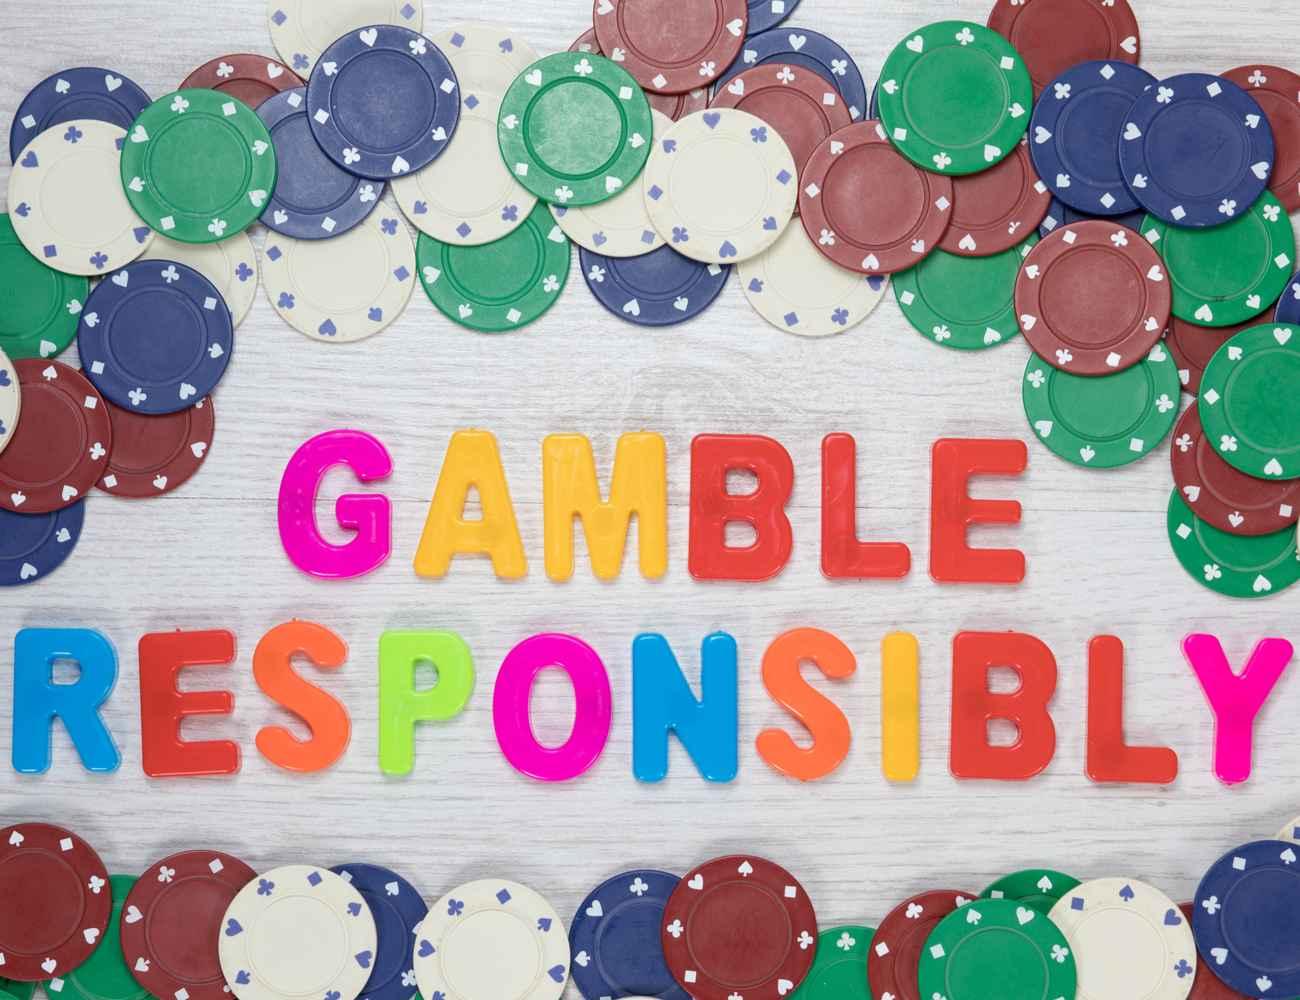 Gamble responsibly written in fridge magnet lettering